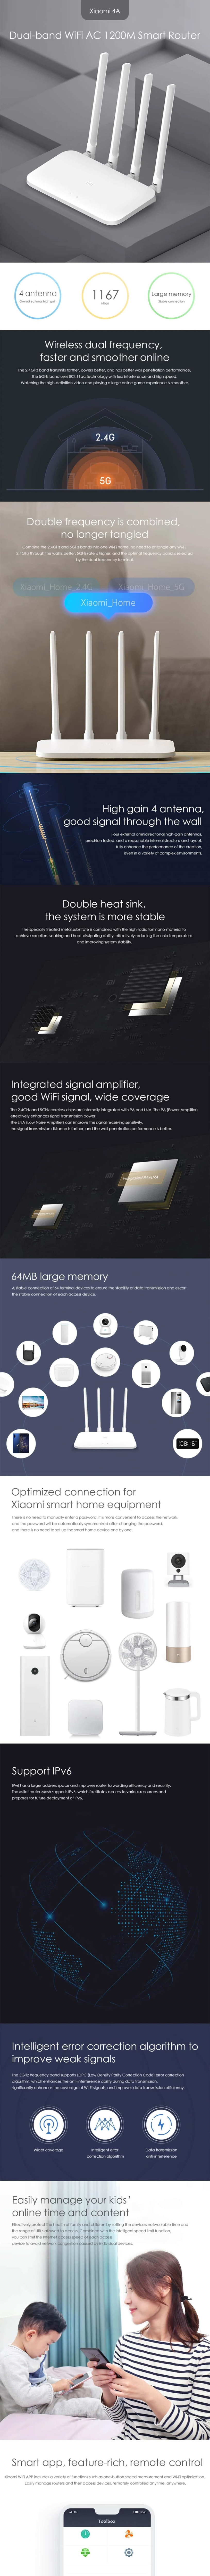 Prezentare-Xiaomi-Mi-Router-4A46d6cc86ef667a3c.jpg